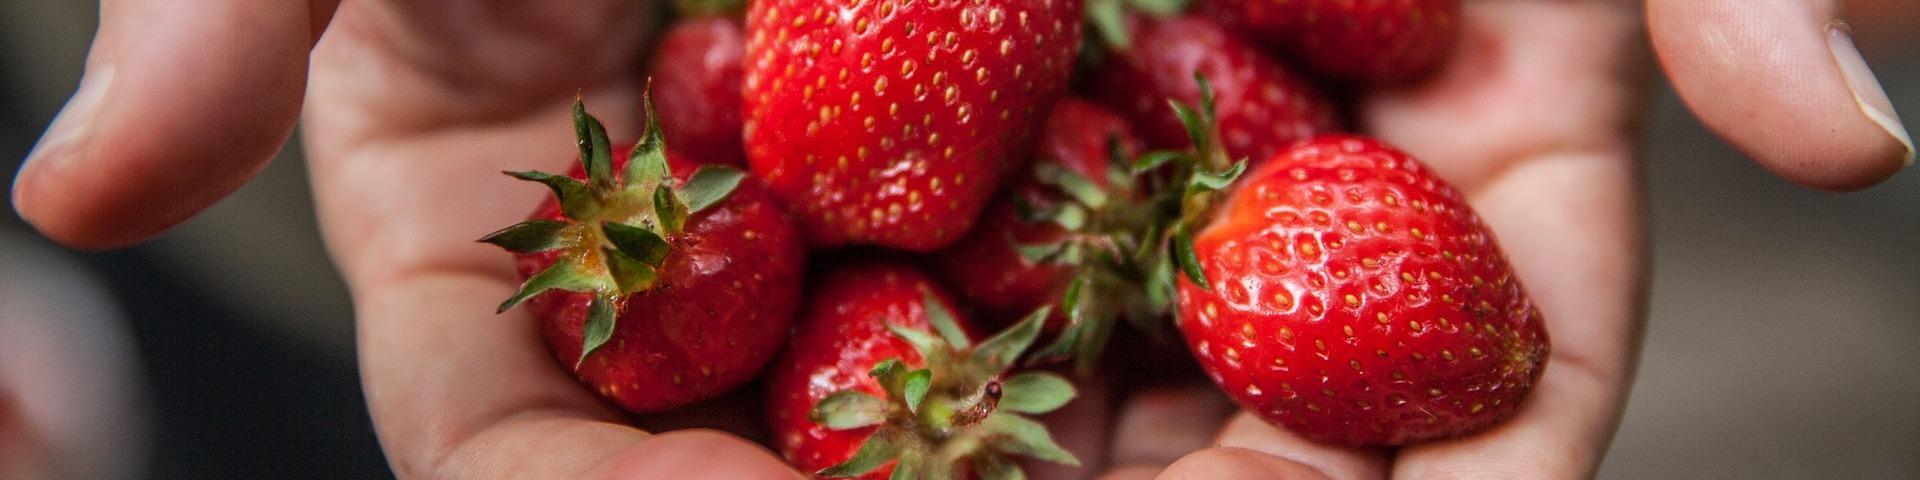 Manos sosteniendo fresas